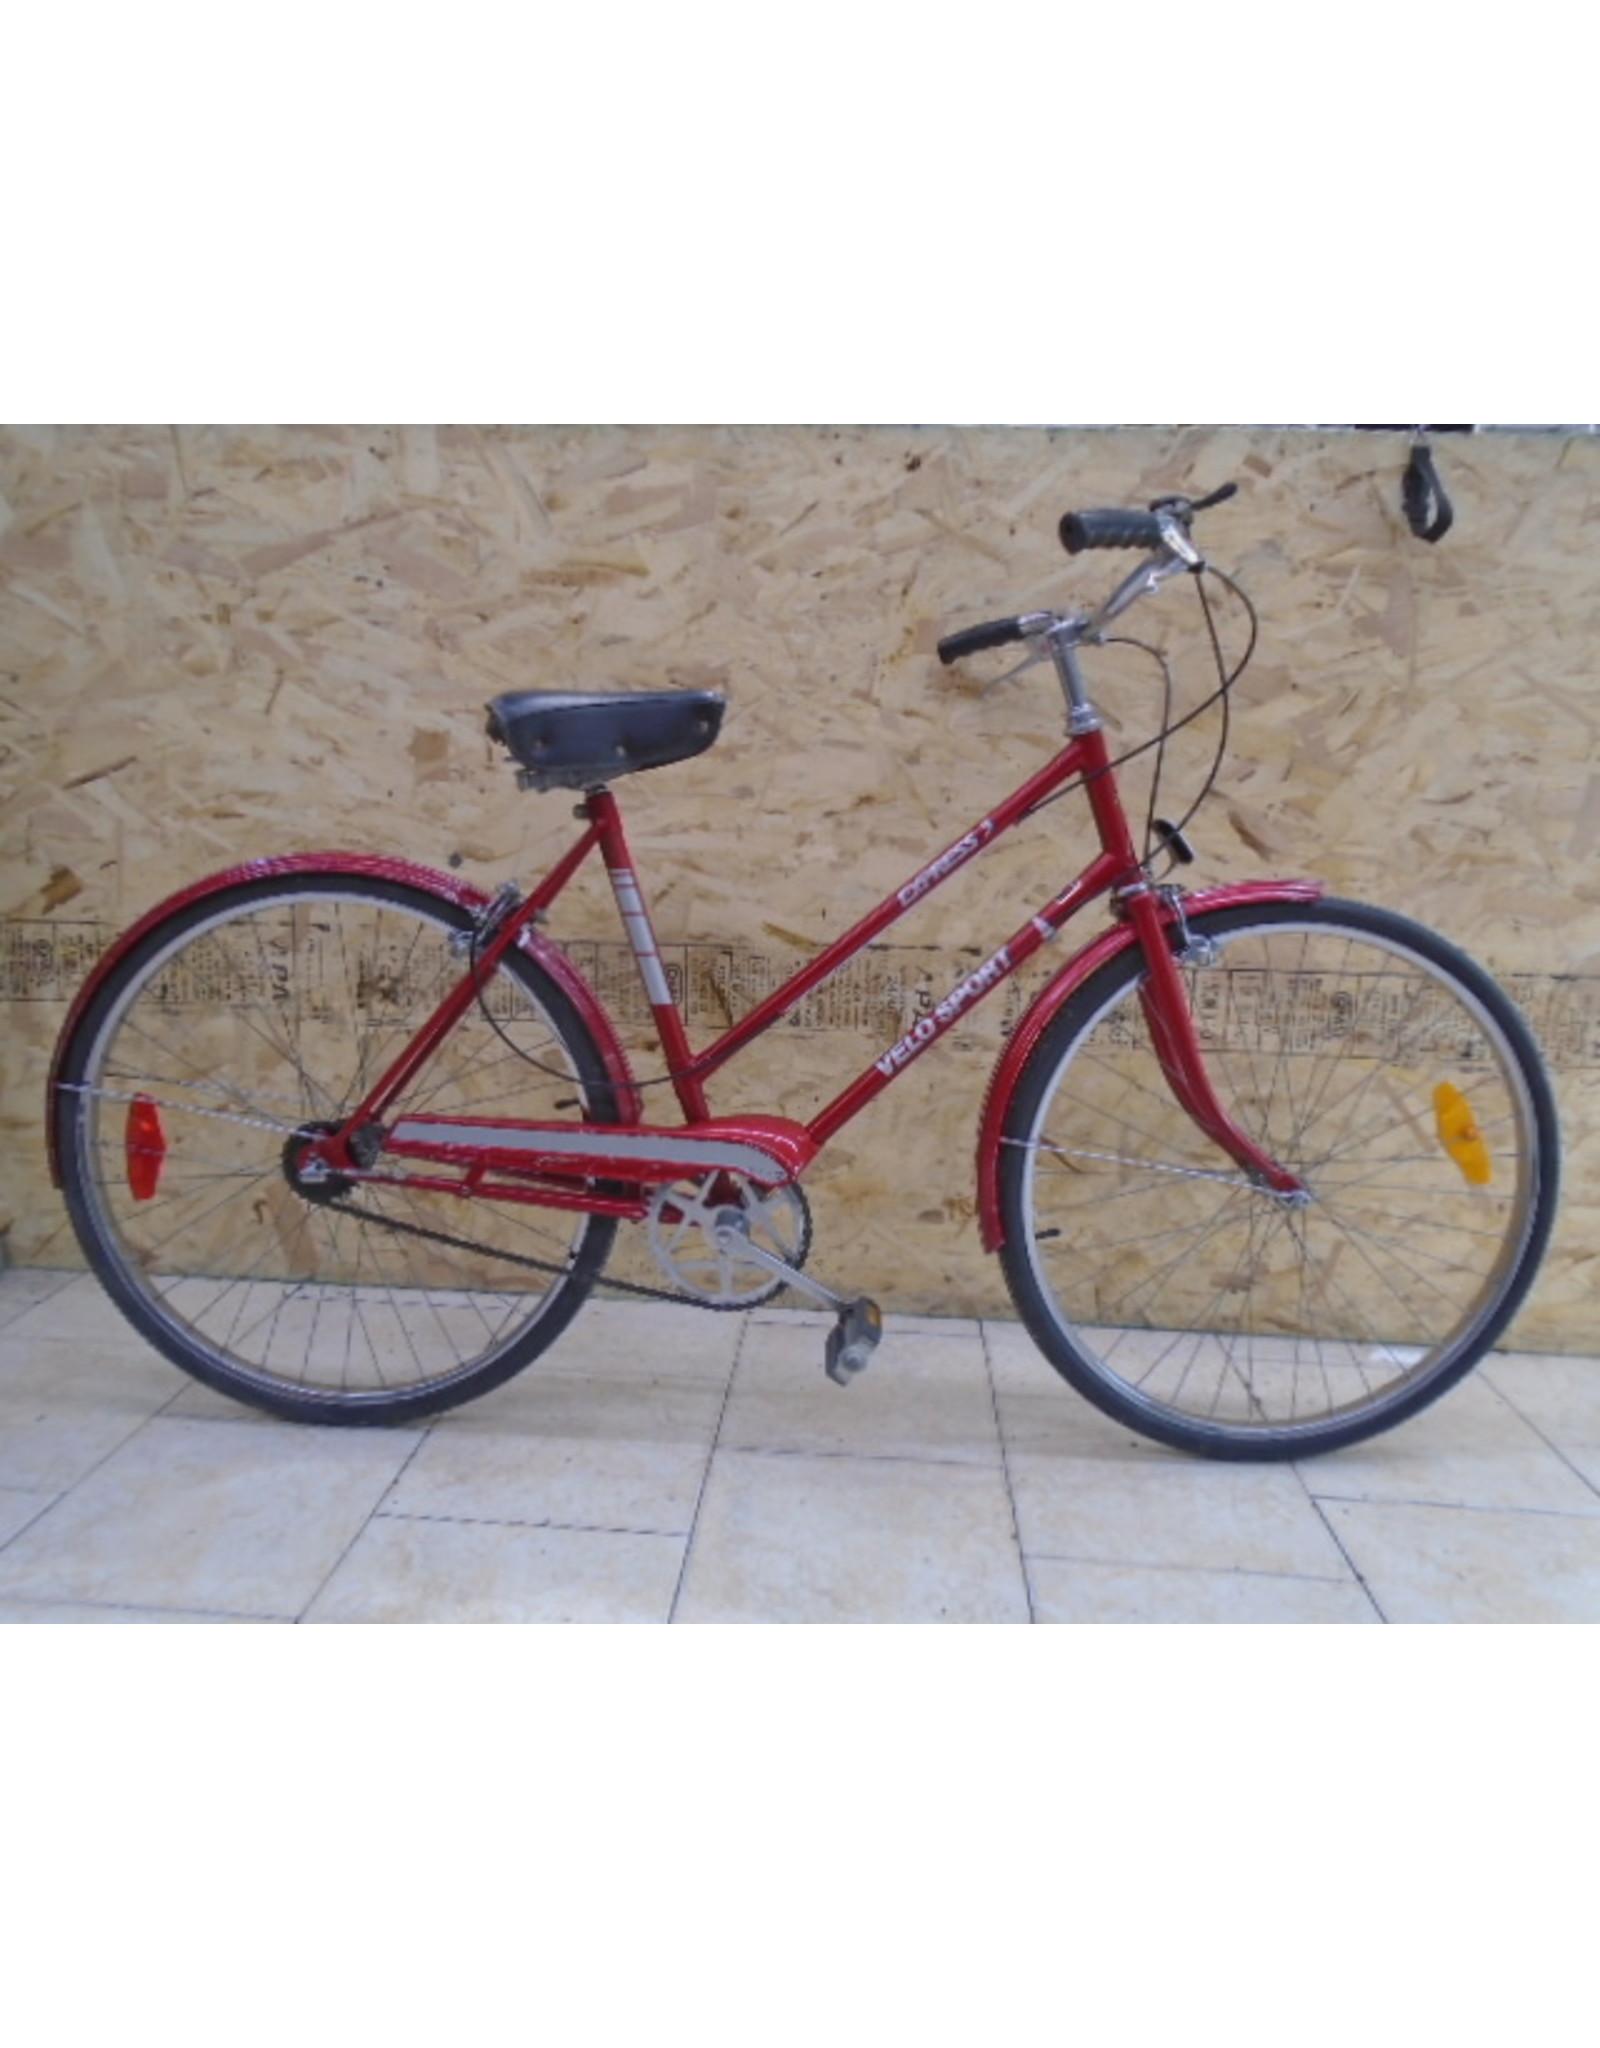 "Vélo usagé de ville Vélo Sport 20"" - 9180"